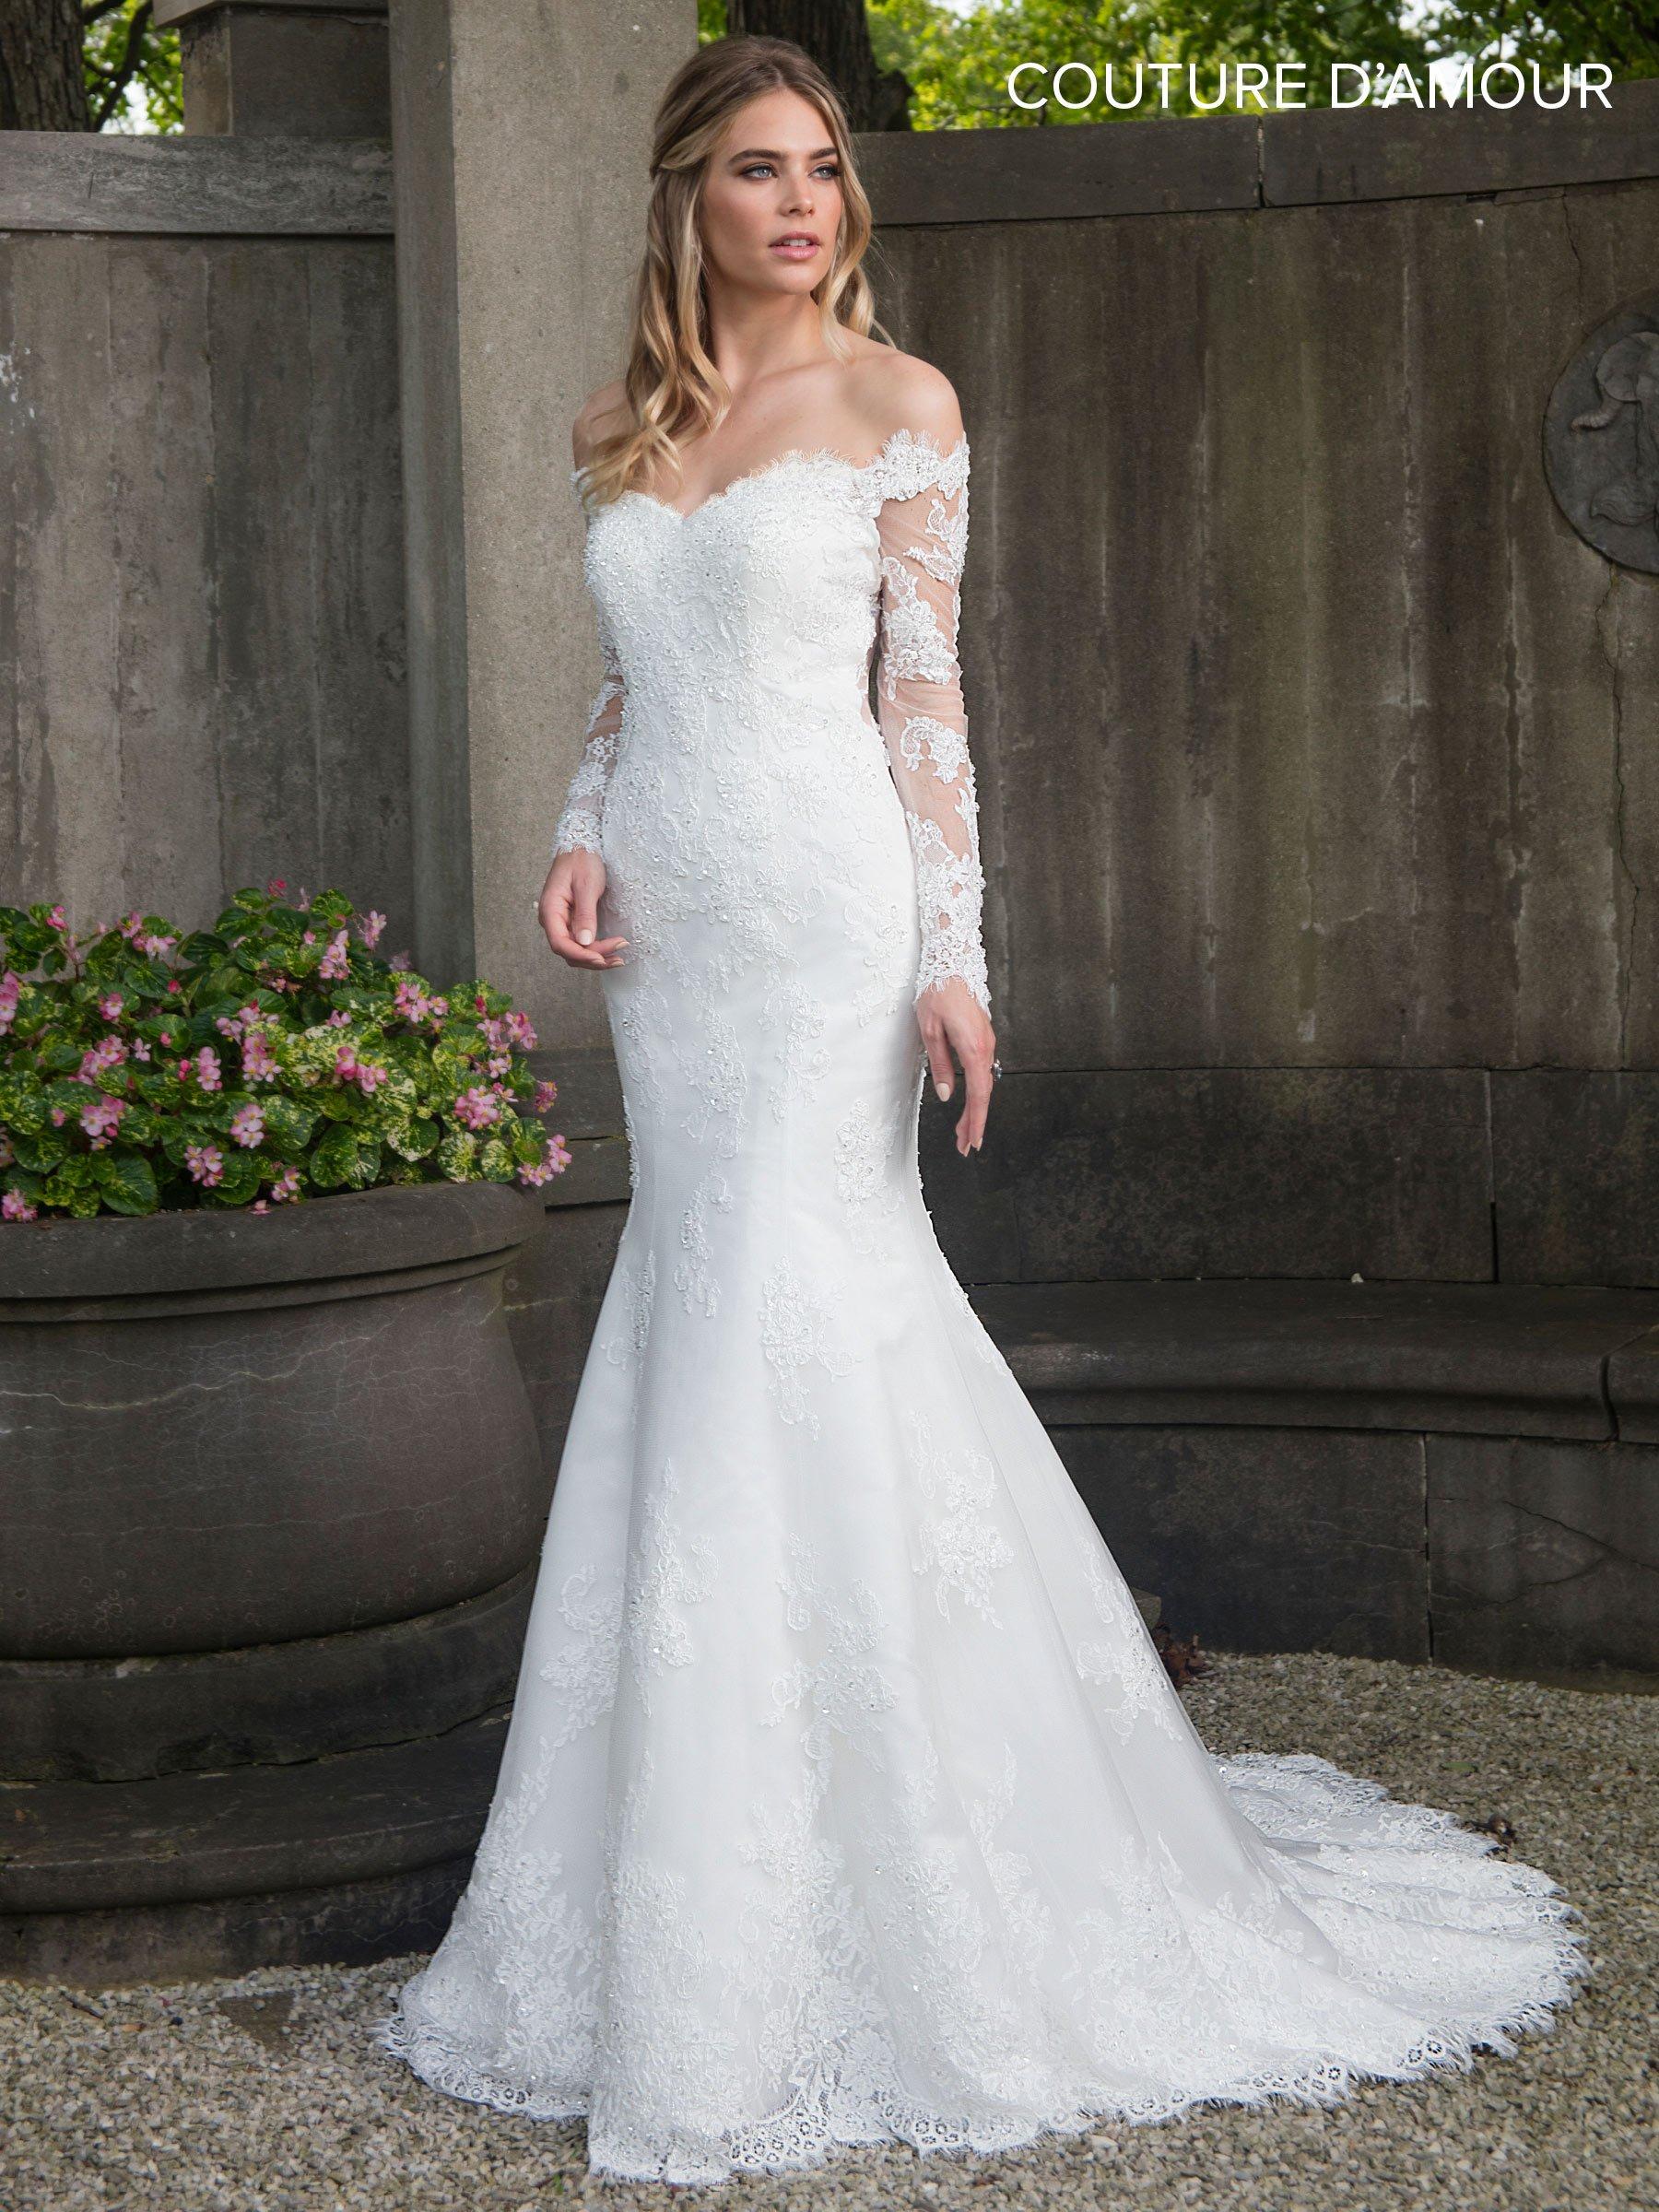 Off the shoulder mermaid wedding dress by maryus bridal mb ekkor